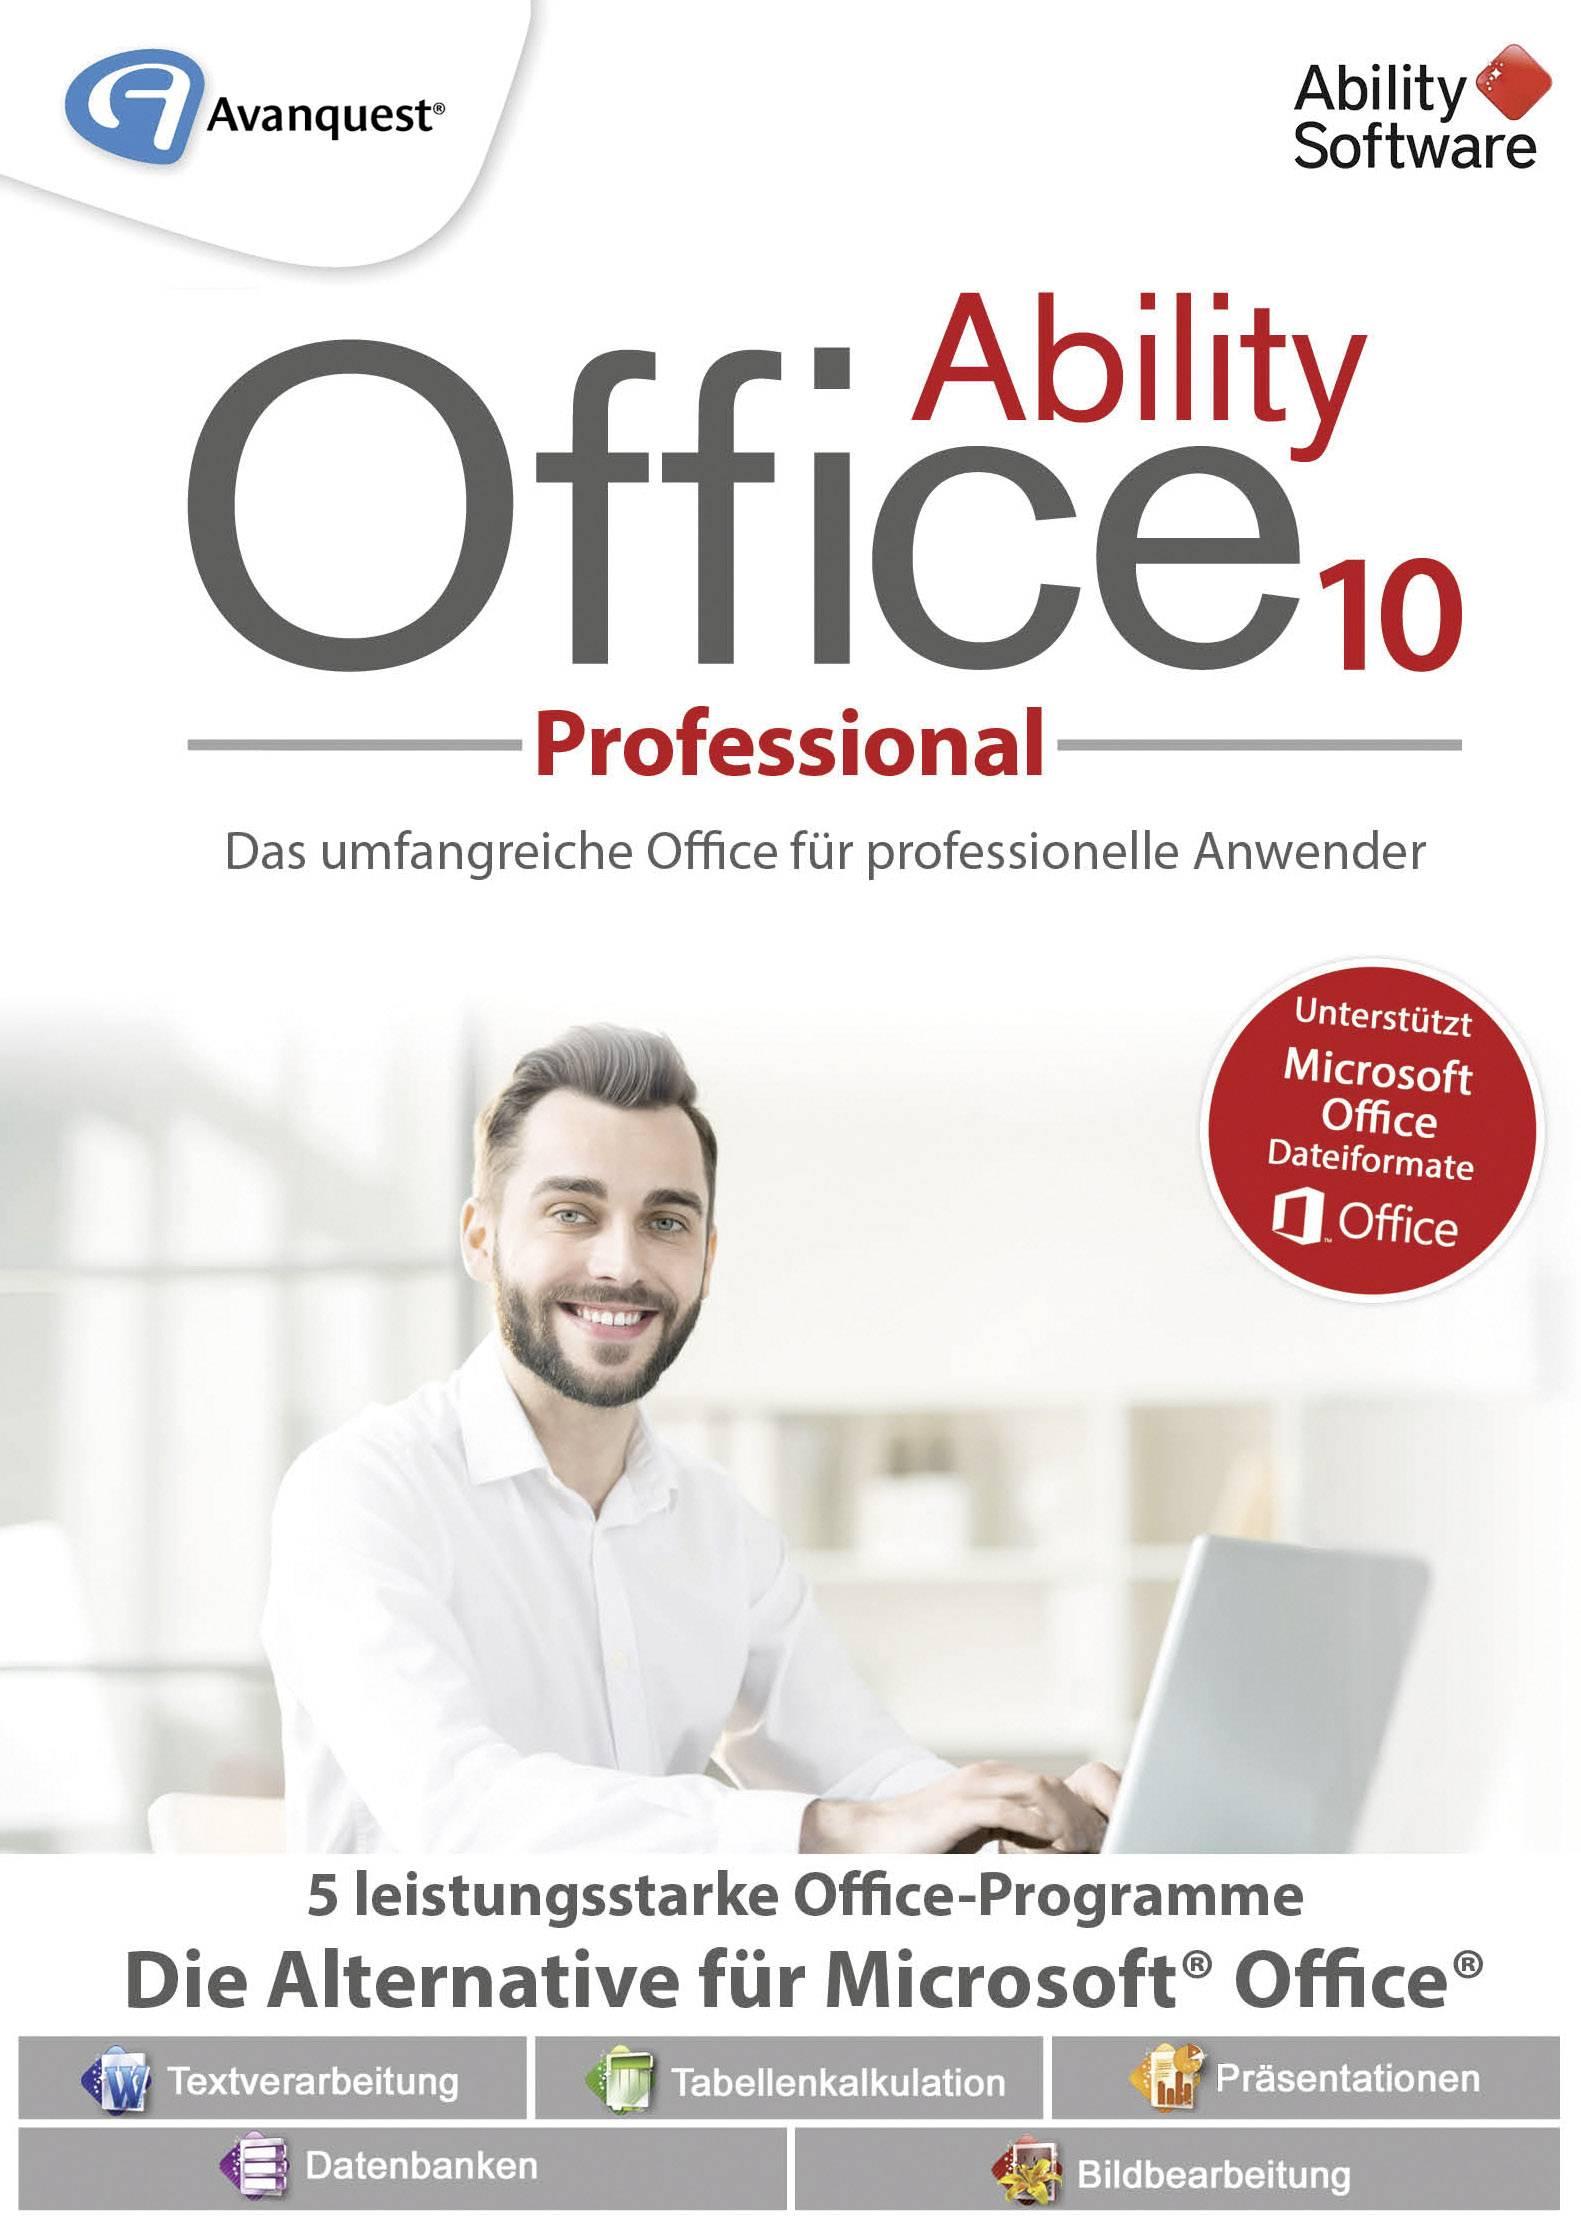 Ability Office Pro 10.0.3  [Herramienta ofimatica sin igual] [Ingles] [UL.IO] Image